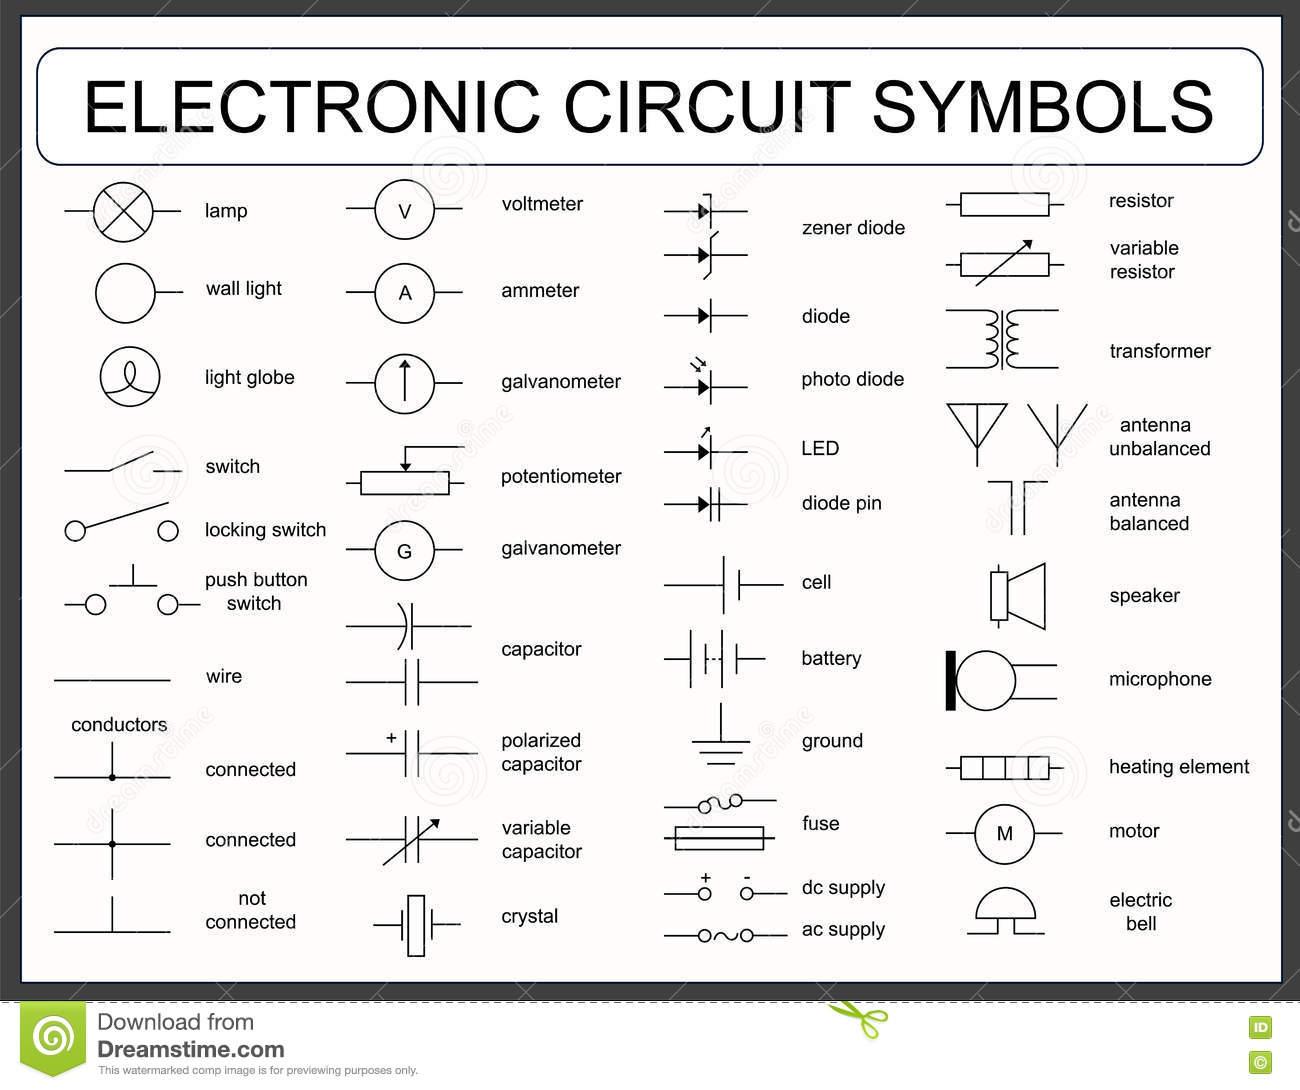 DB_1579] Electronic Circuit Symbol Free DiagramFlui Oupli Drosi Onica Mentra Minaga Subd Ropye Hete Inama Mohammedshrine  Librar Wiring 101